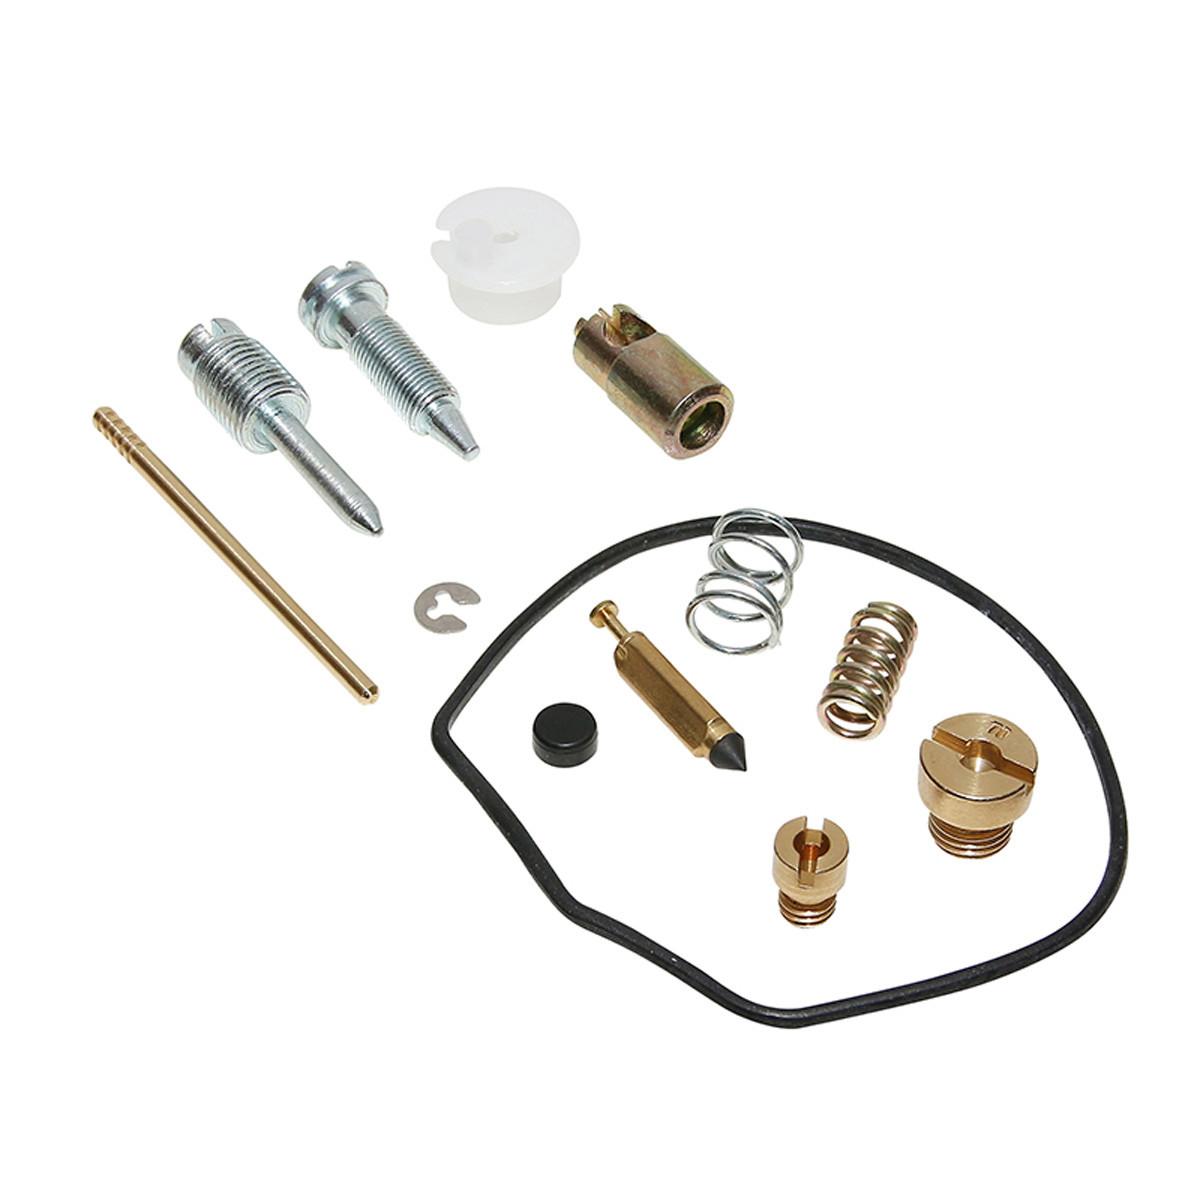 Kit Réparation Carburateur Dellorto PHBN 12mm MBK Booster Nitro Yamaha Aerox Bw's